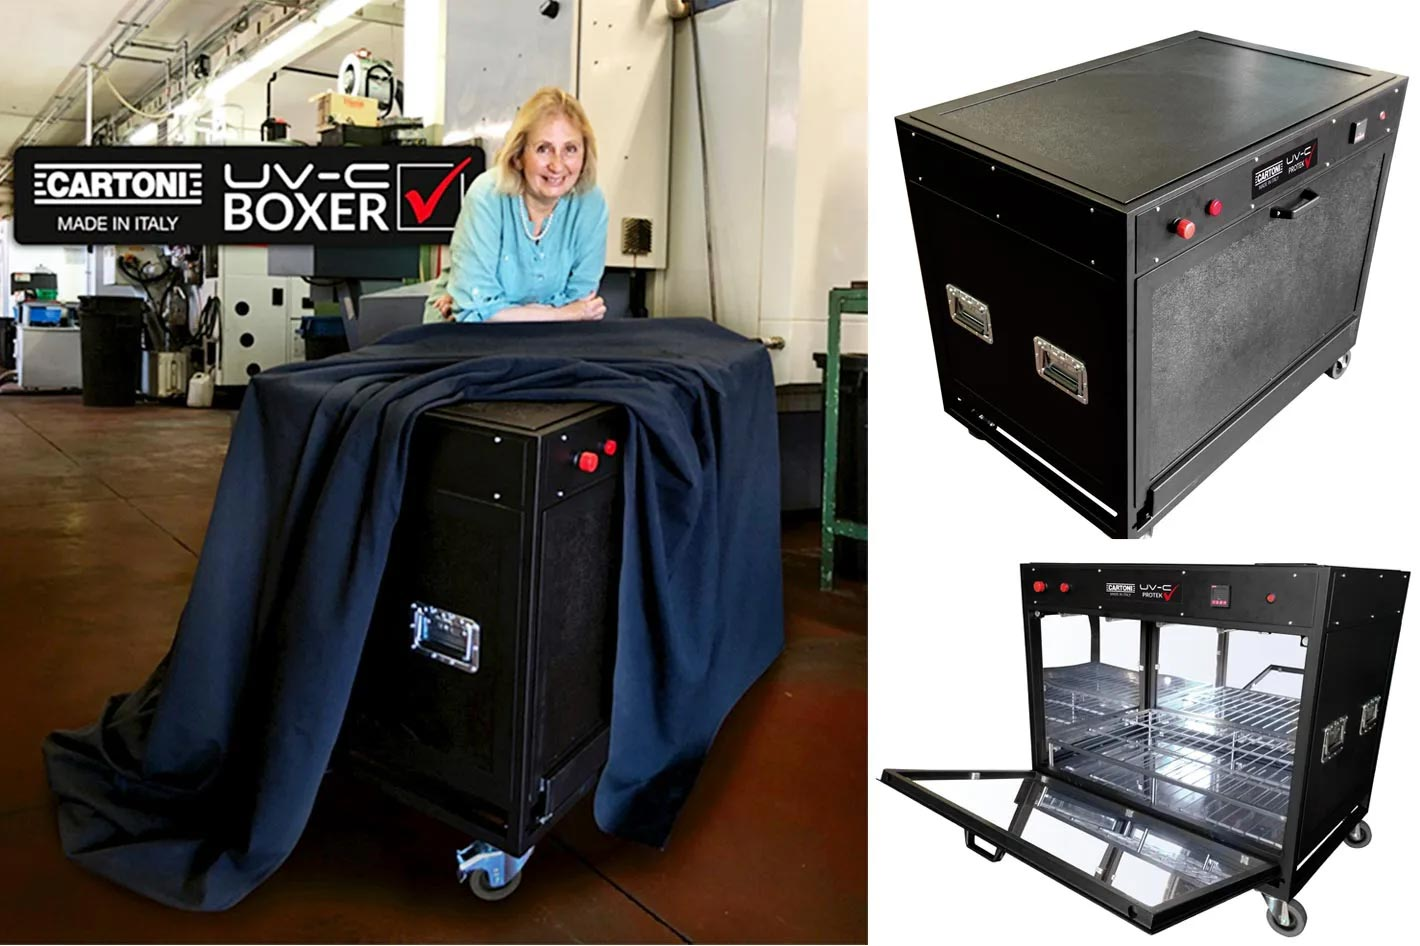 Cartoni UV-C Boxer neutralizes Covid-19 in 3 minutes